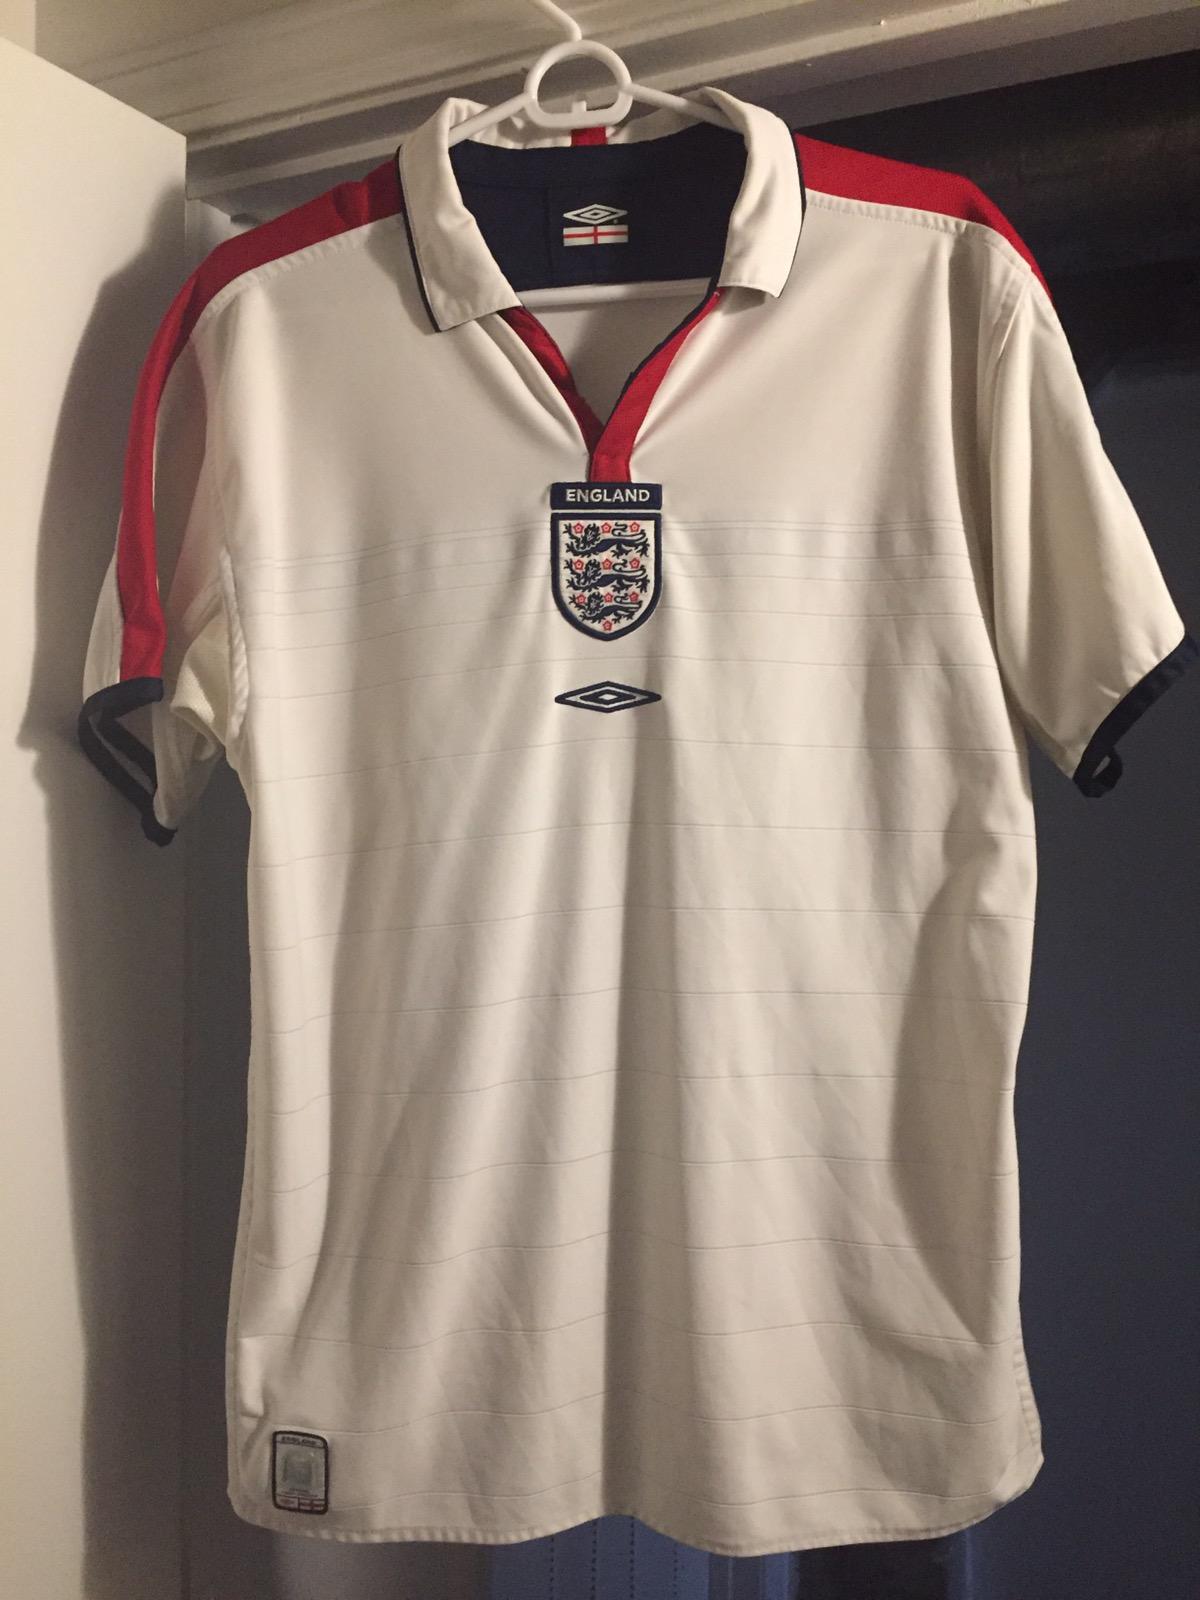 buy online 9b627 26359 England National Football/Soccer Reversible Kit/Jersey